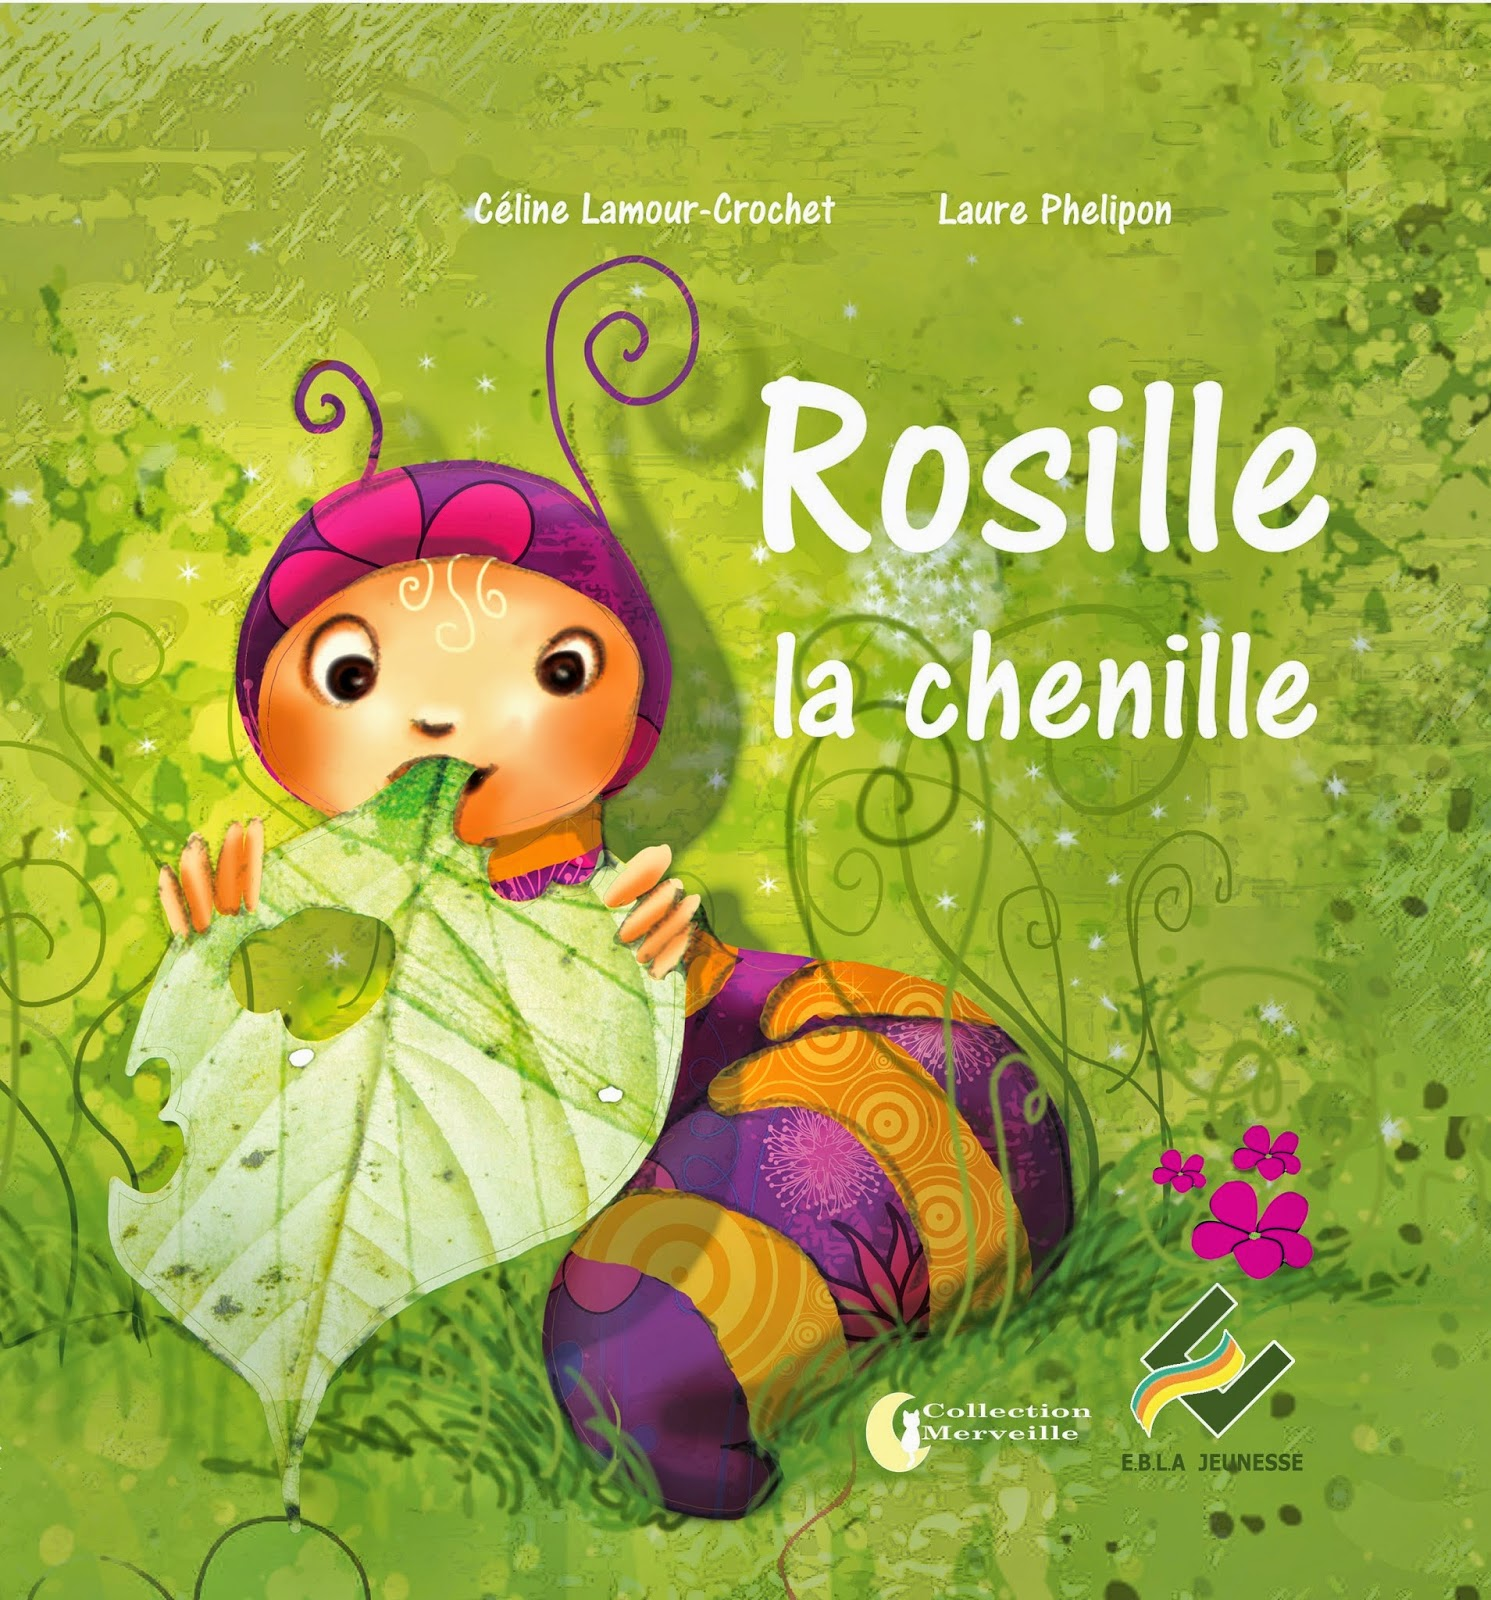 http://www.amazon.fr/PS-MS-GS-Rosille-chenille-C%C3%A9line-Lamour-Crochet/dp/2362040275/ref=sr_1_1?s=books&ie=UTF8&qid=1397992324&sr=1-1&keywords=c%C3%A9line+lamour-crochet